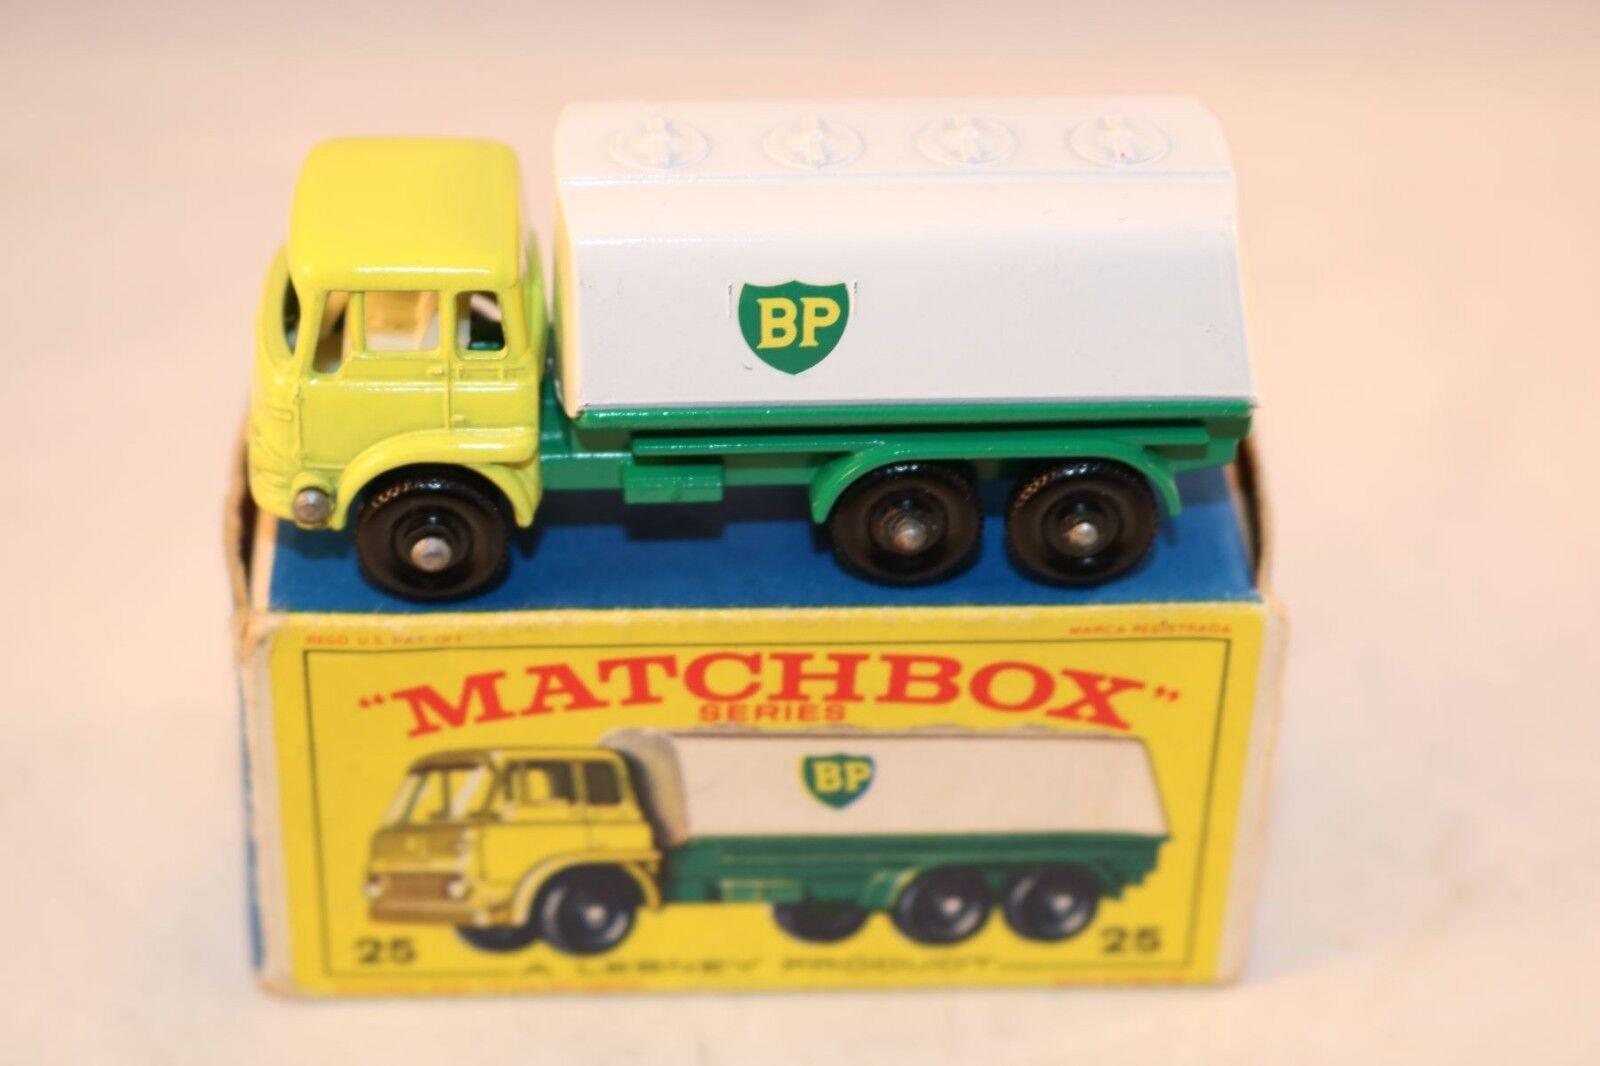 Matchbox Lesney 25 Bedford BP Tanker 99.9% mint mint mint in box all original Superb a415c6